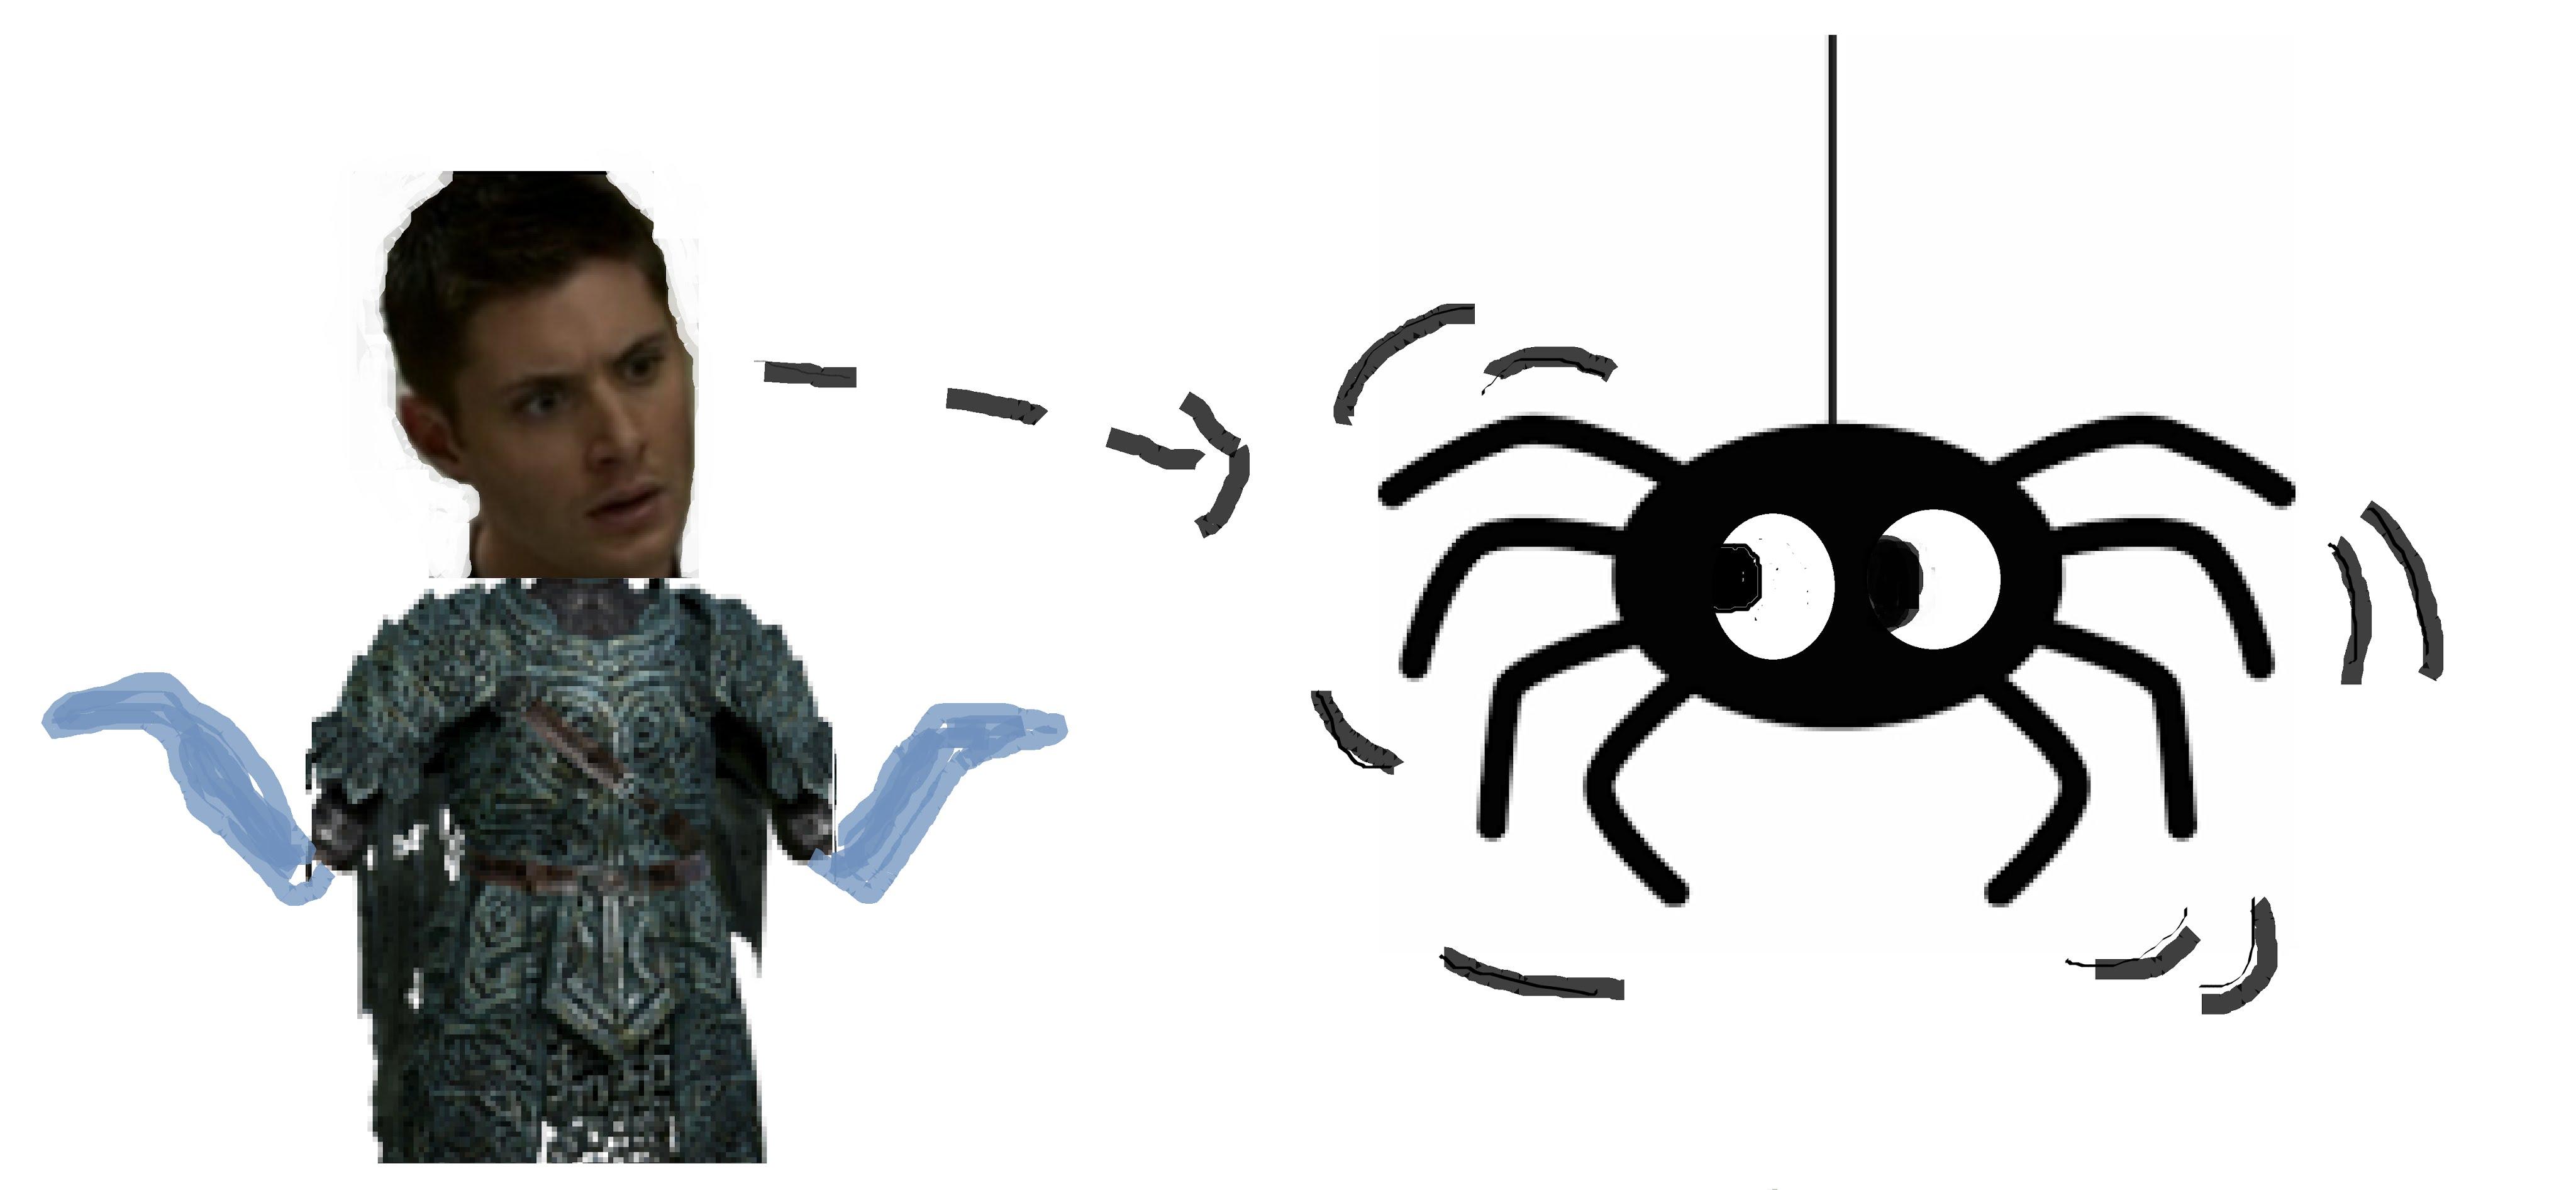 Glitch clipart spider #7